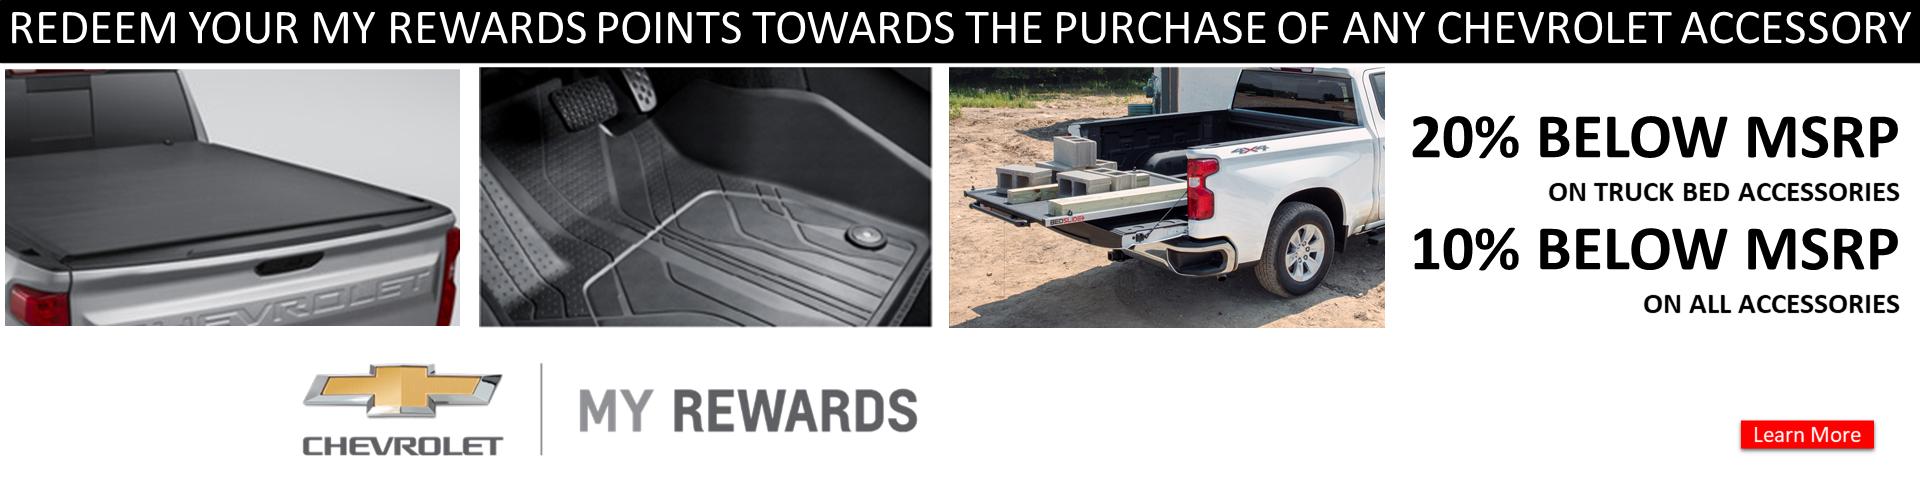 Dealer Website Banners (October 2021) Chevrolet (2Kx5.14)